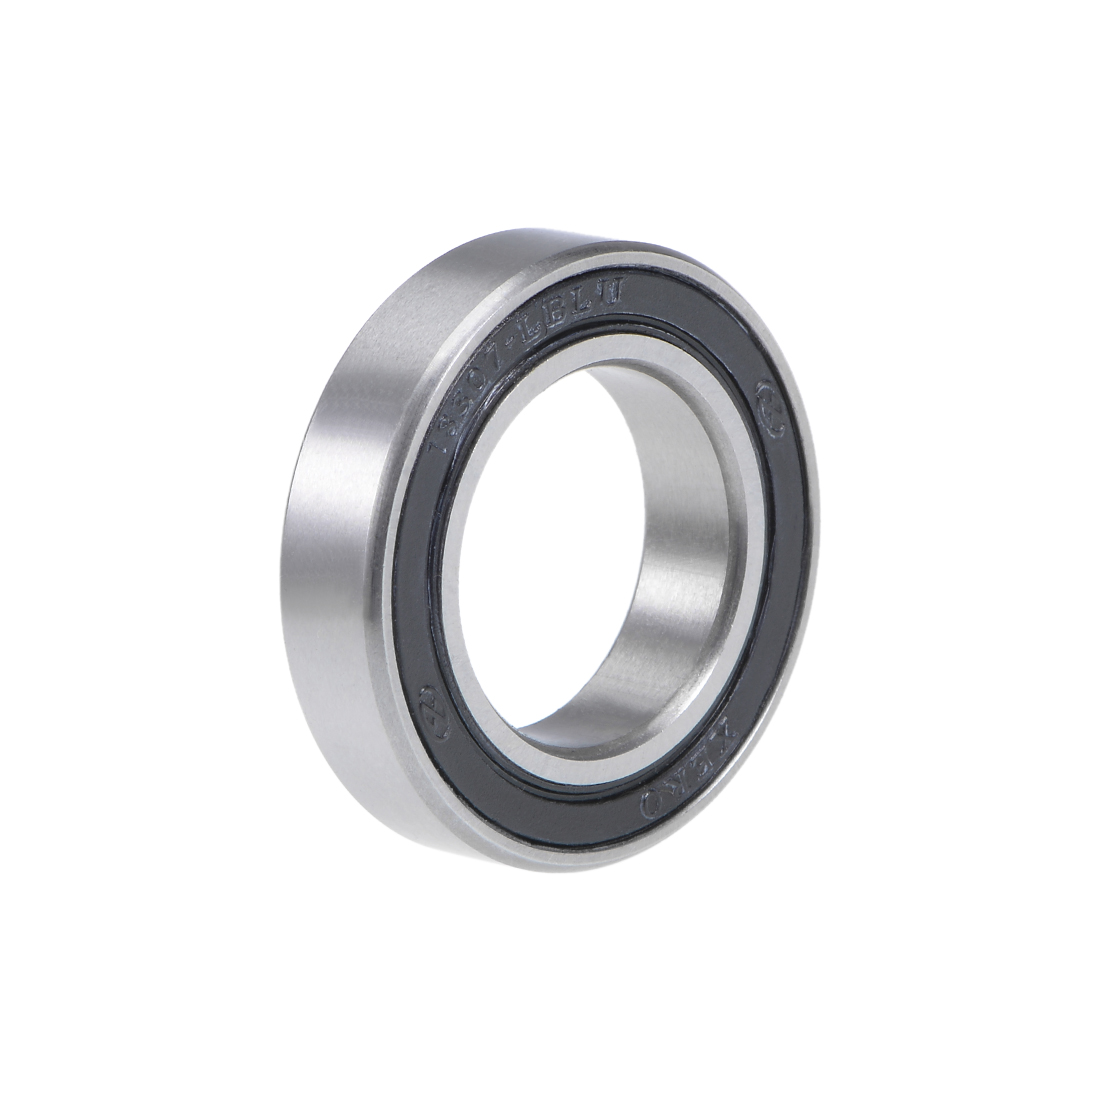 MR18307-2RS Deep Groove Ball Bearing 18x30x7mm Double Sealed Chrome Bearings